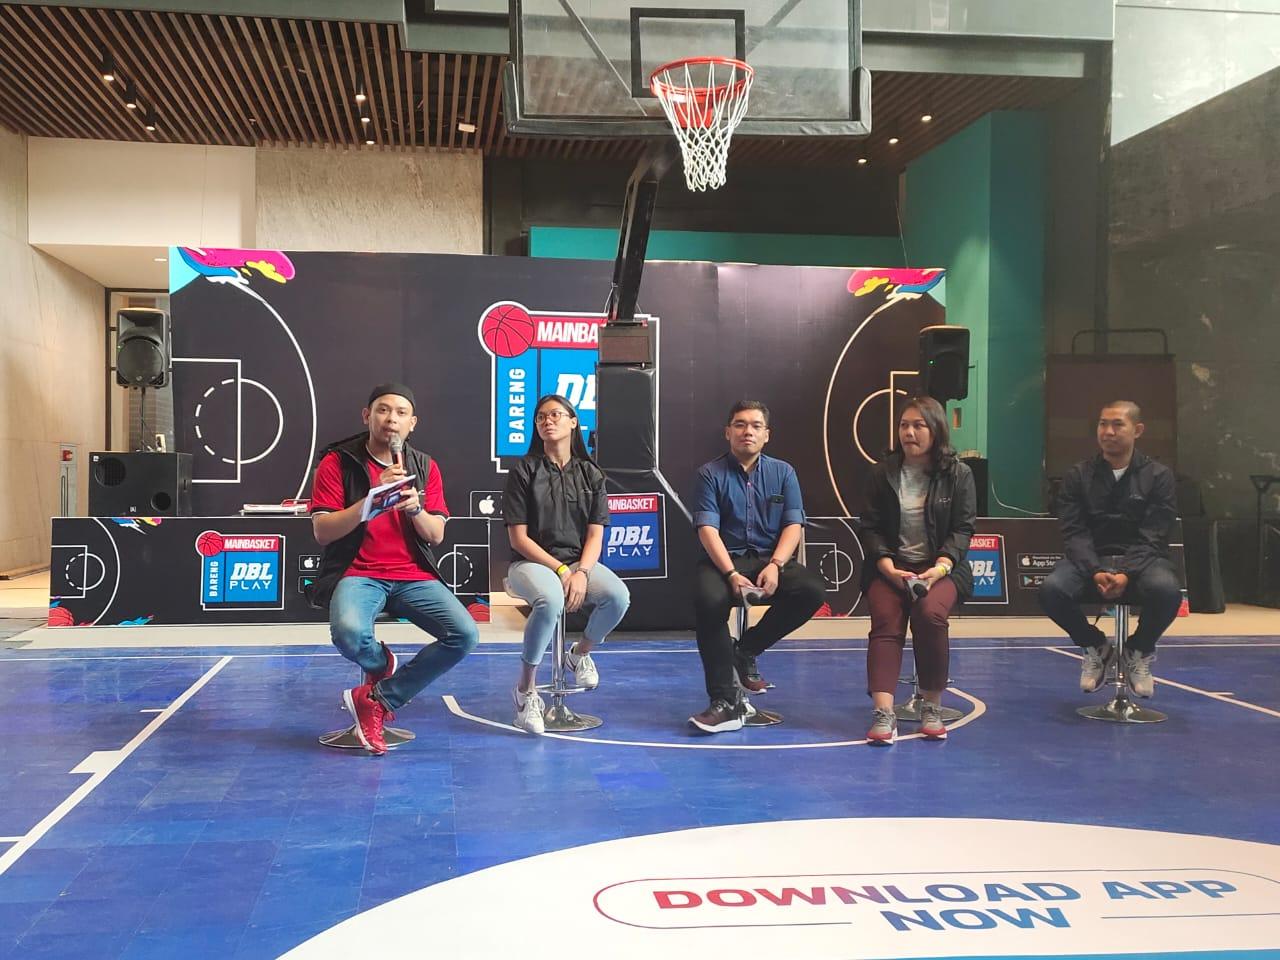 KFC dan DBL Play Kembangkan Basket 3x3